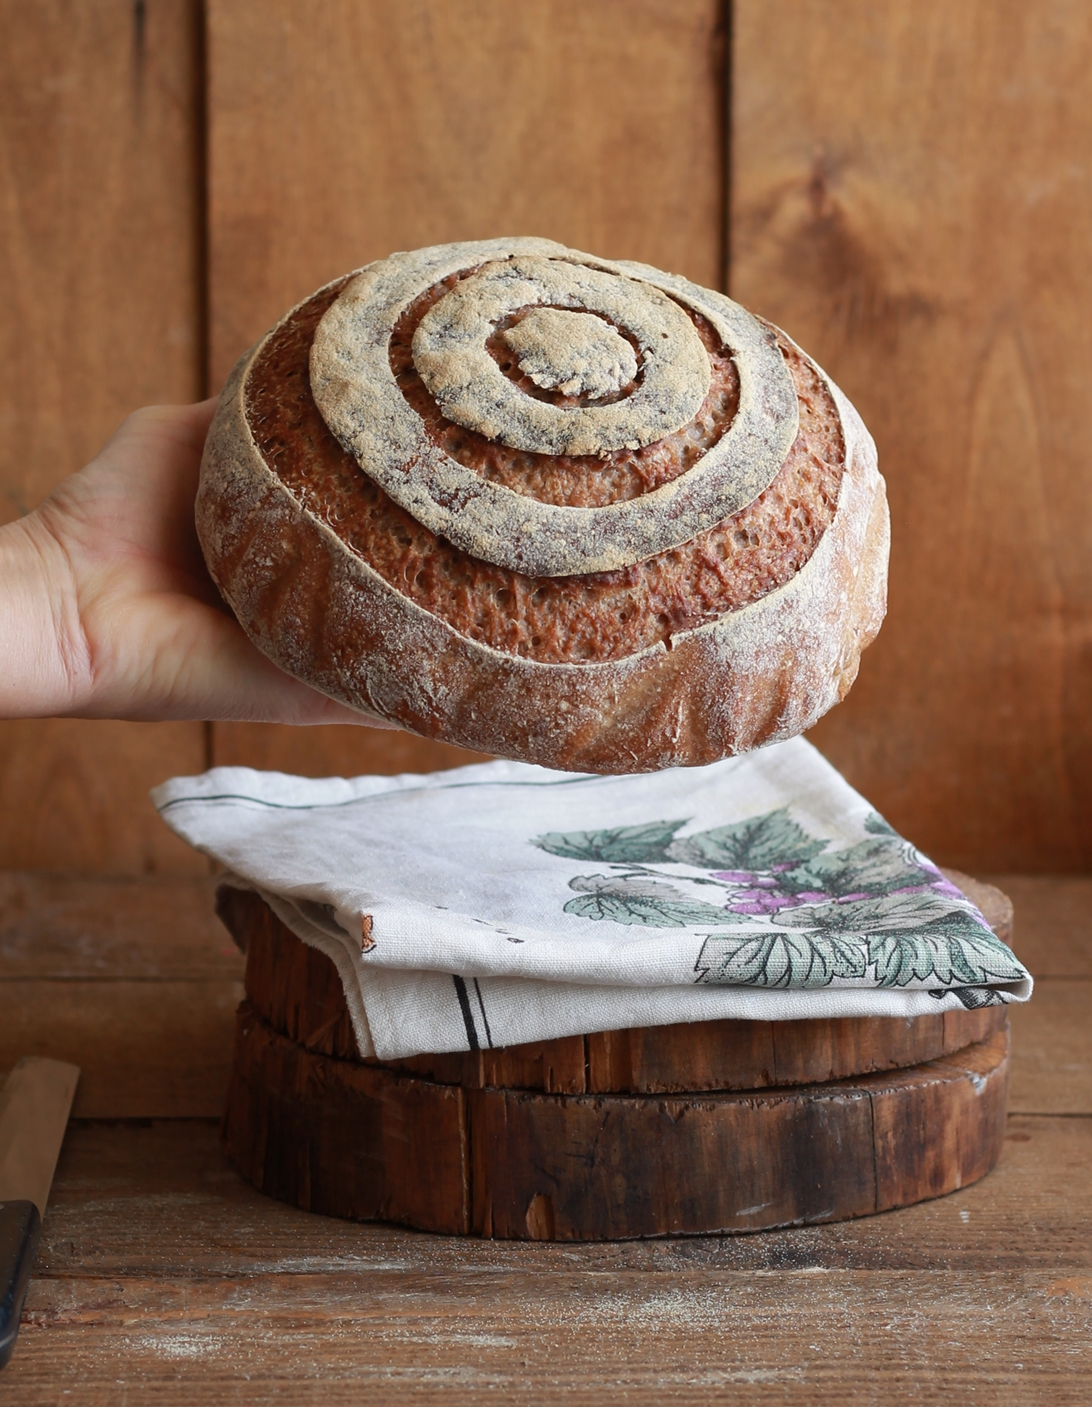 Pane integrale alla birra senza glutine - La Cassata Celiaca